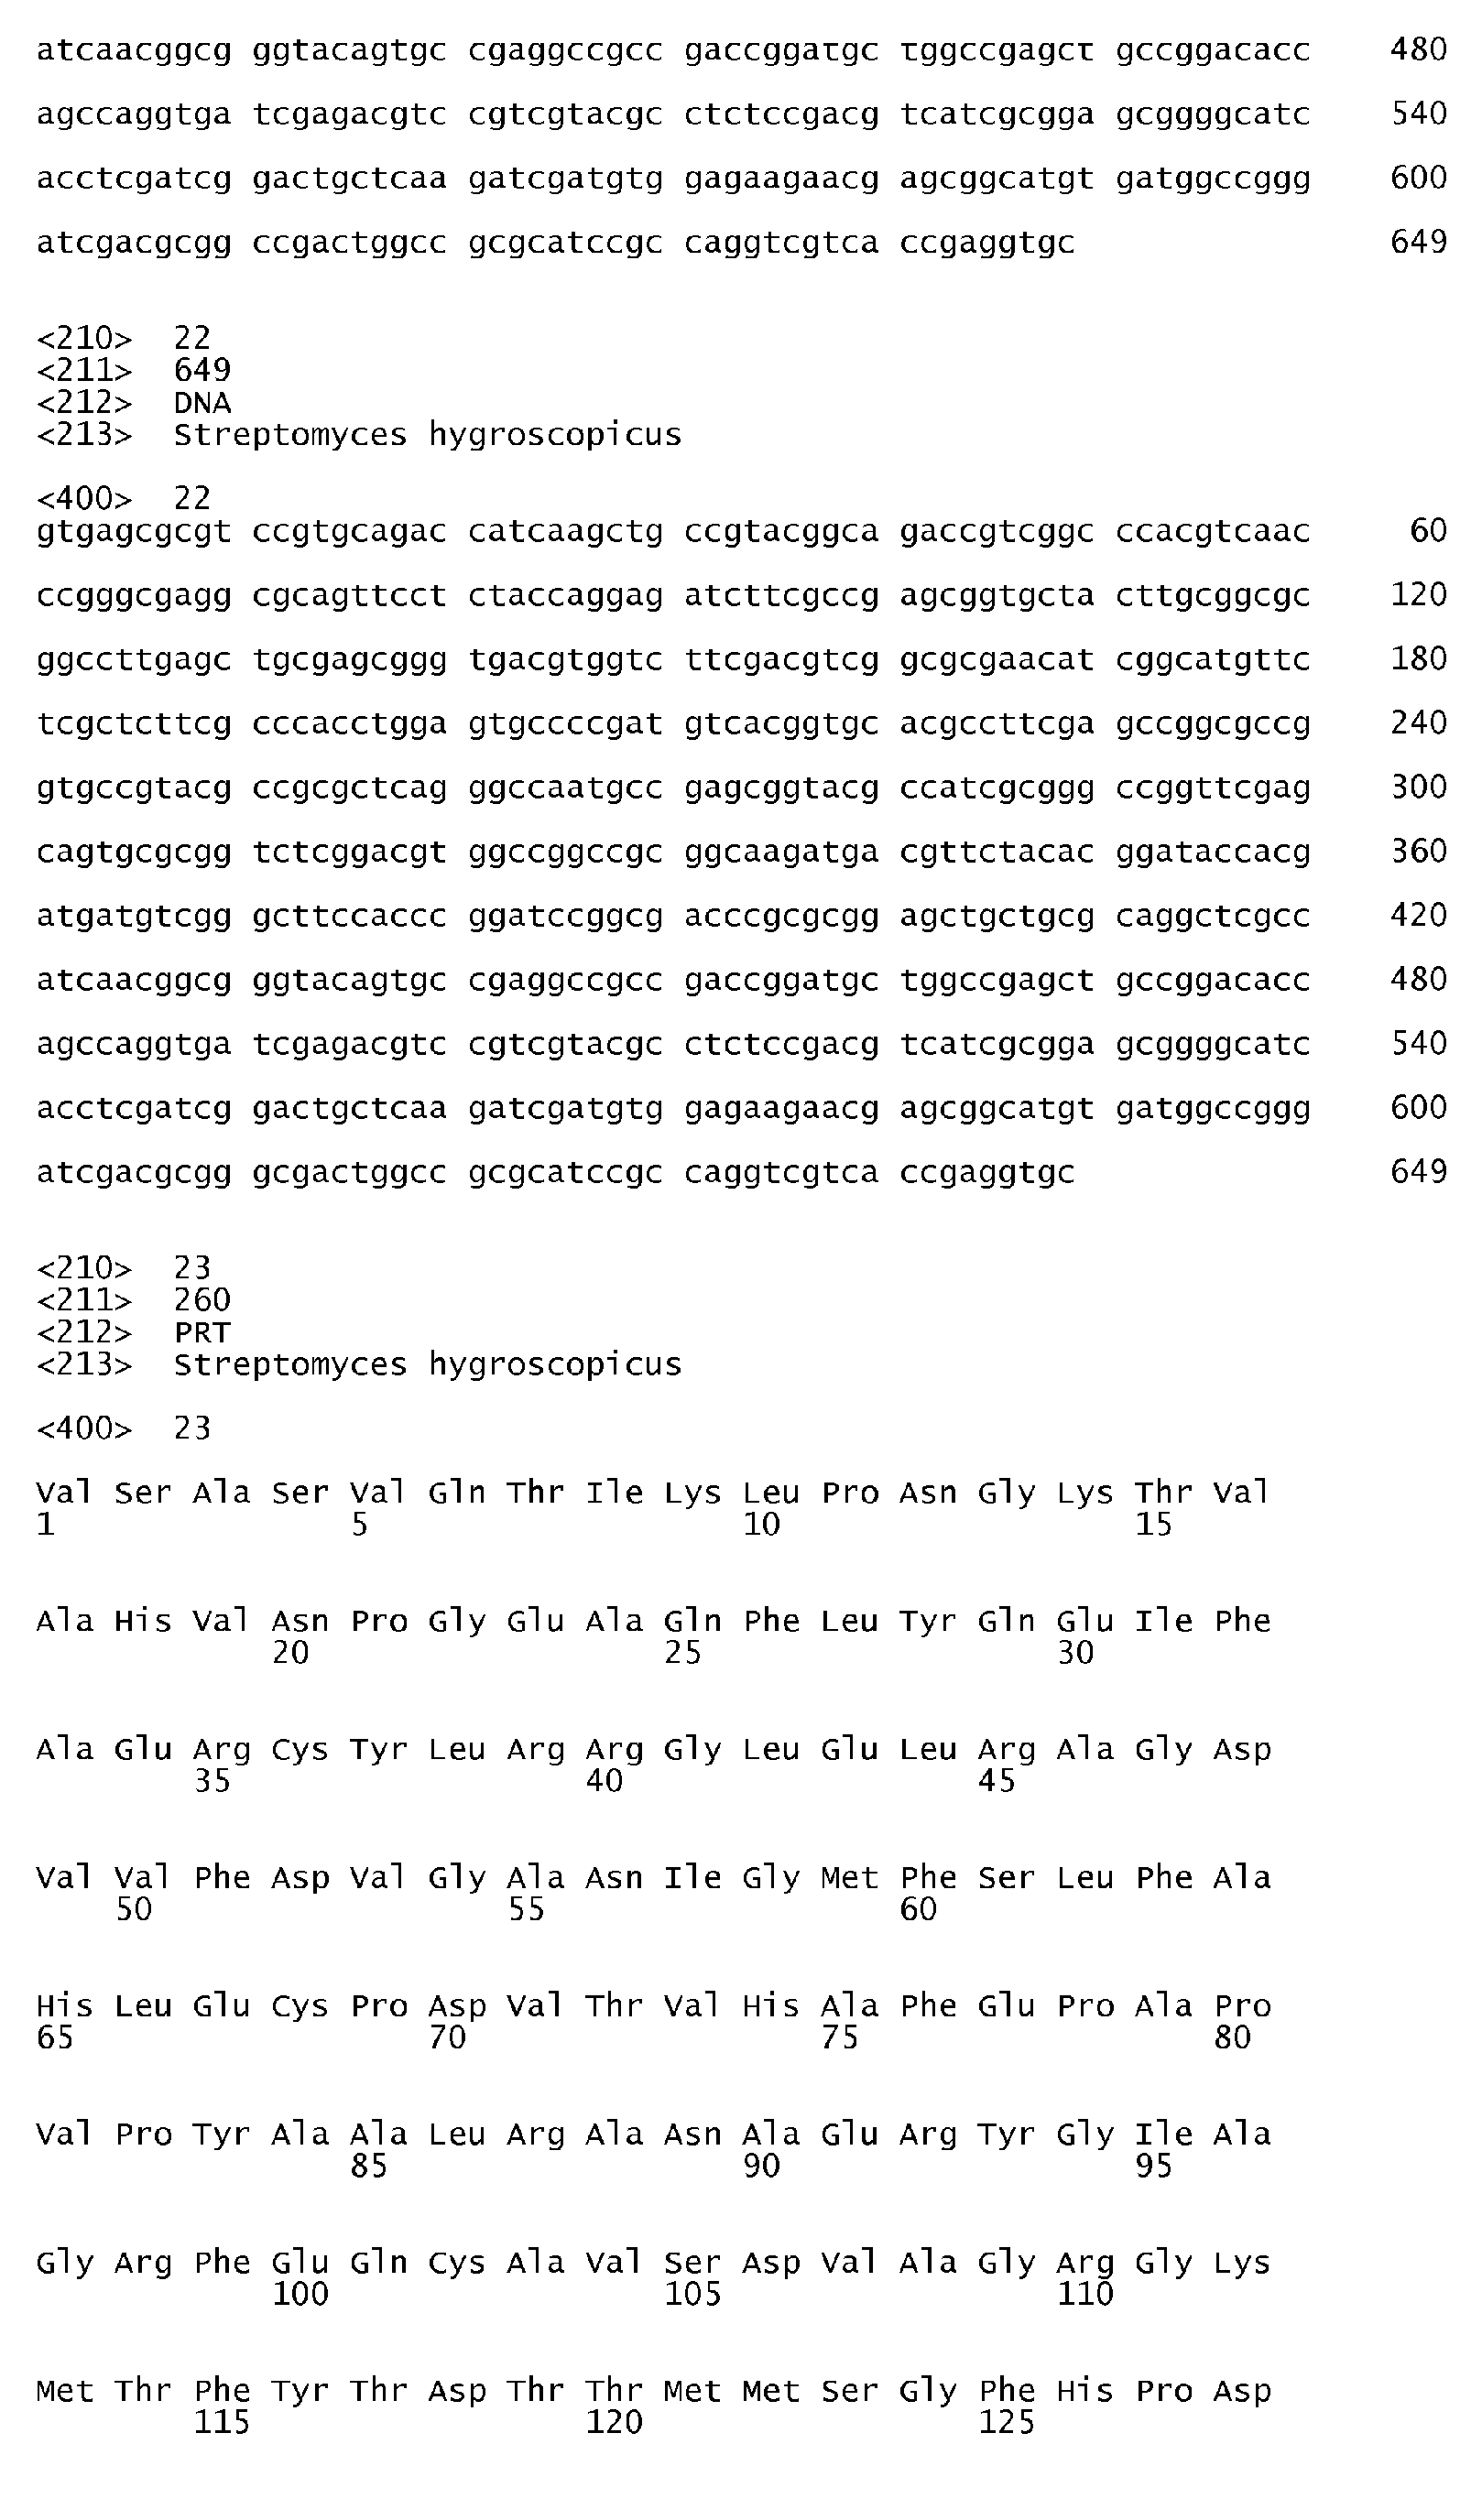 EP2277898A2 - Rapamycin analogues - Google Patents